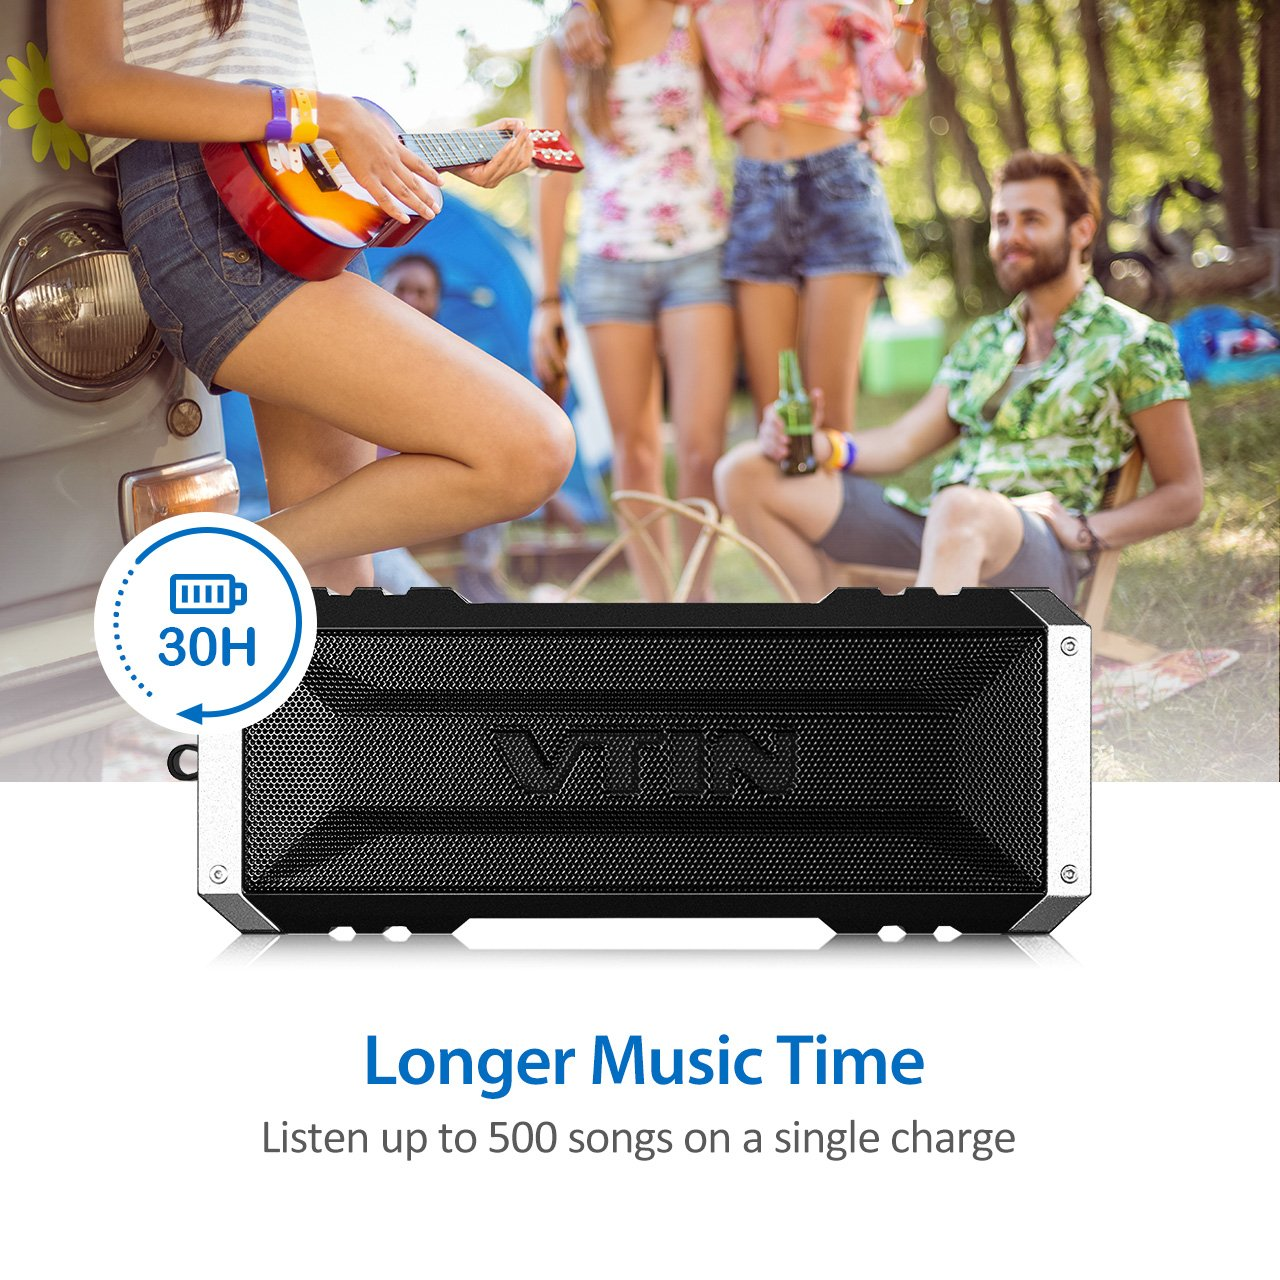 Vtin 20W Outdoor Bluetooth Speaker, Loud Volume, 30 Hours Playtime Portable Wireless Speaker, Waterproof, Dustproof, Shockproof for Indoor and Outdoor Activities - Shower, Pool, Beach, Car, Home by Vtin (Image #4)